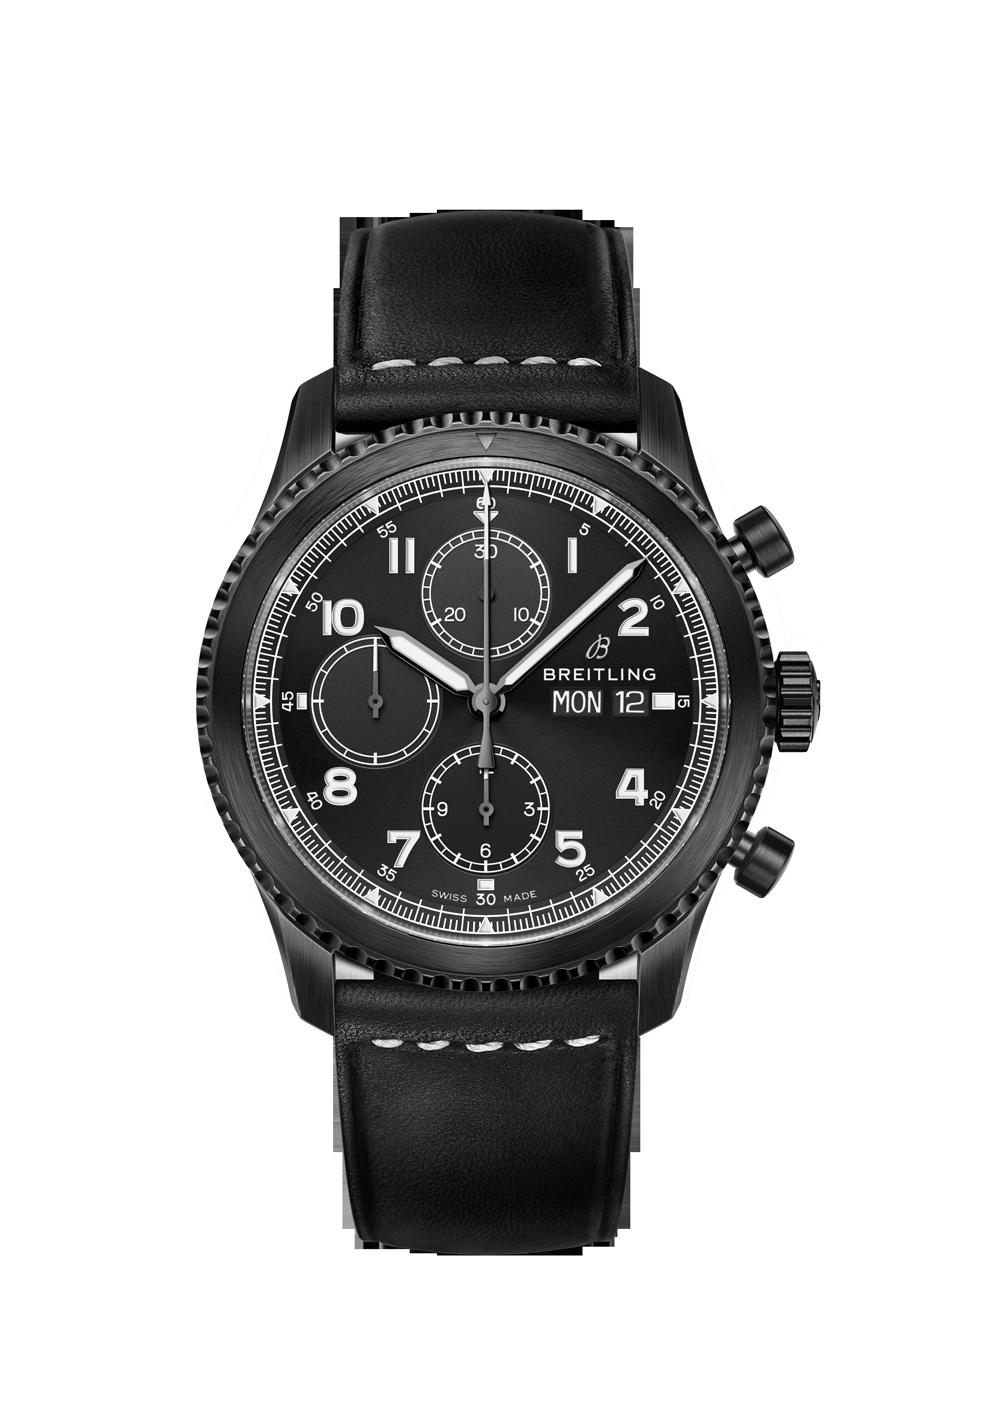 Breitling Navitimer 8 Chronograph Blacksteel bei Juwelier Hungeling